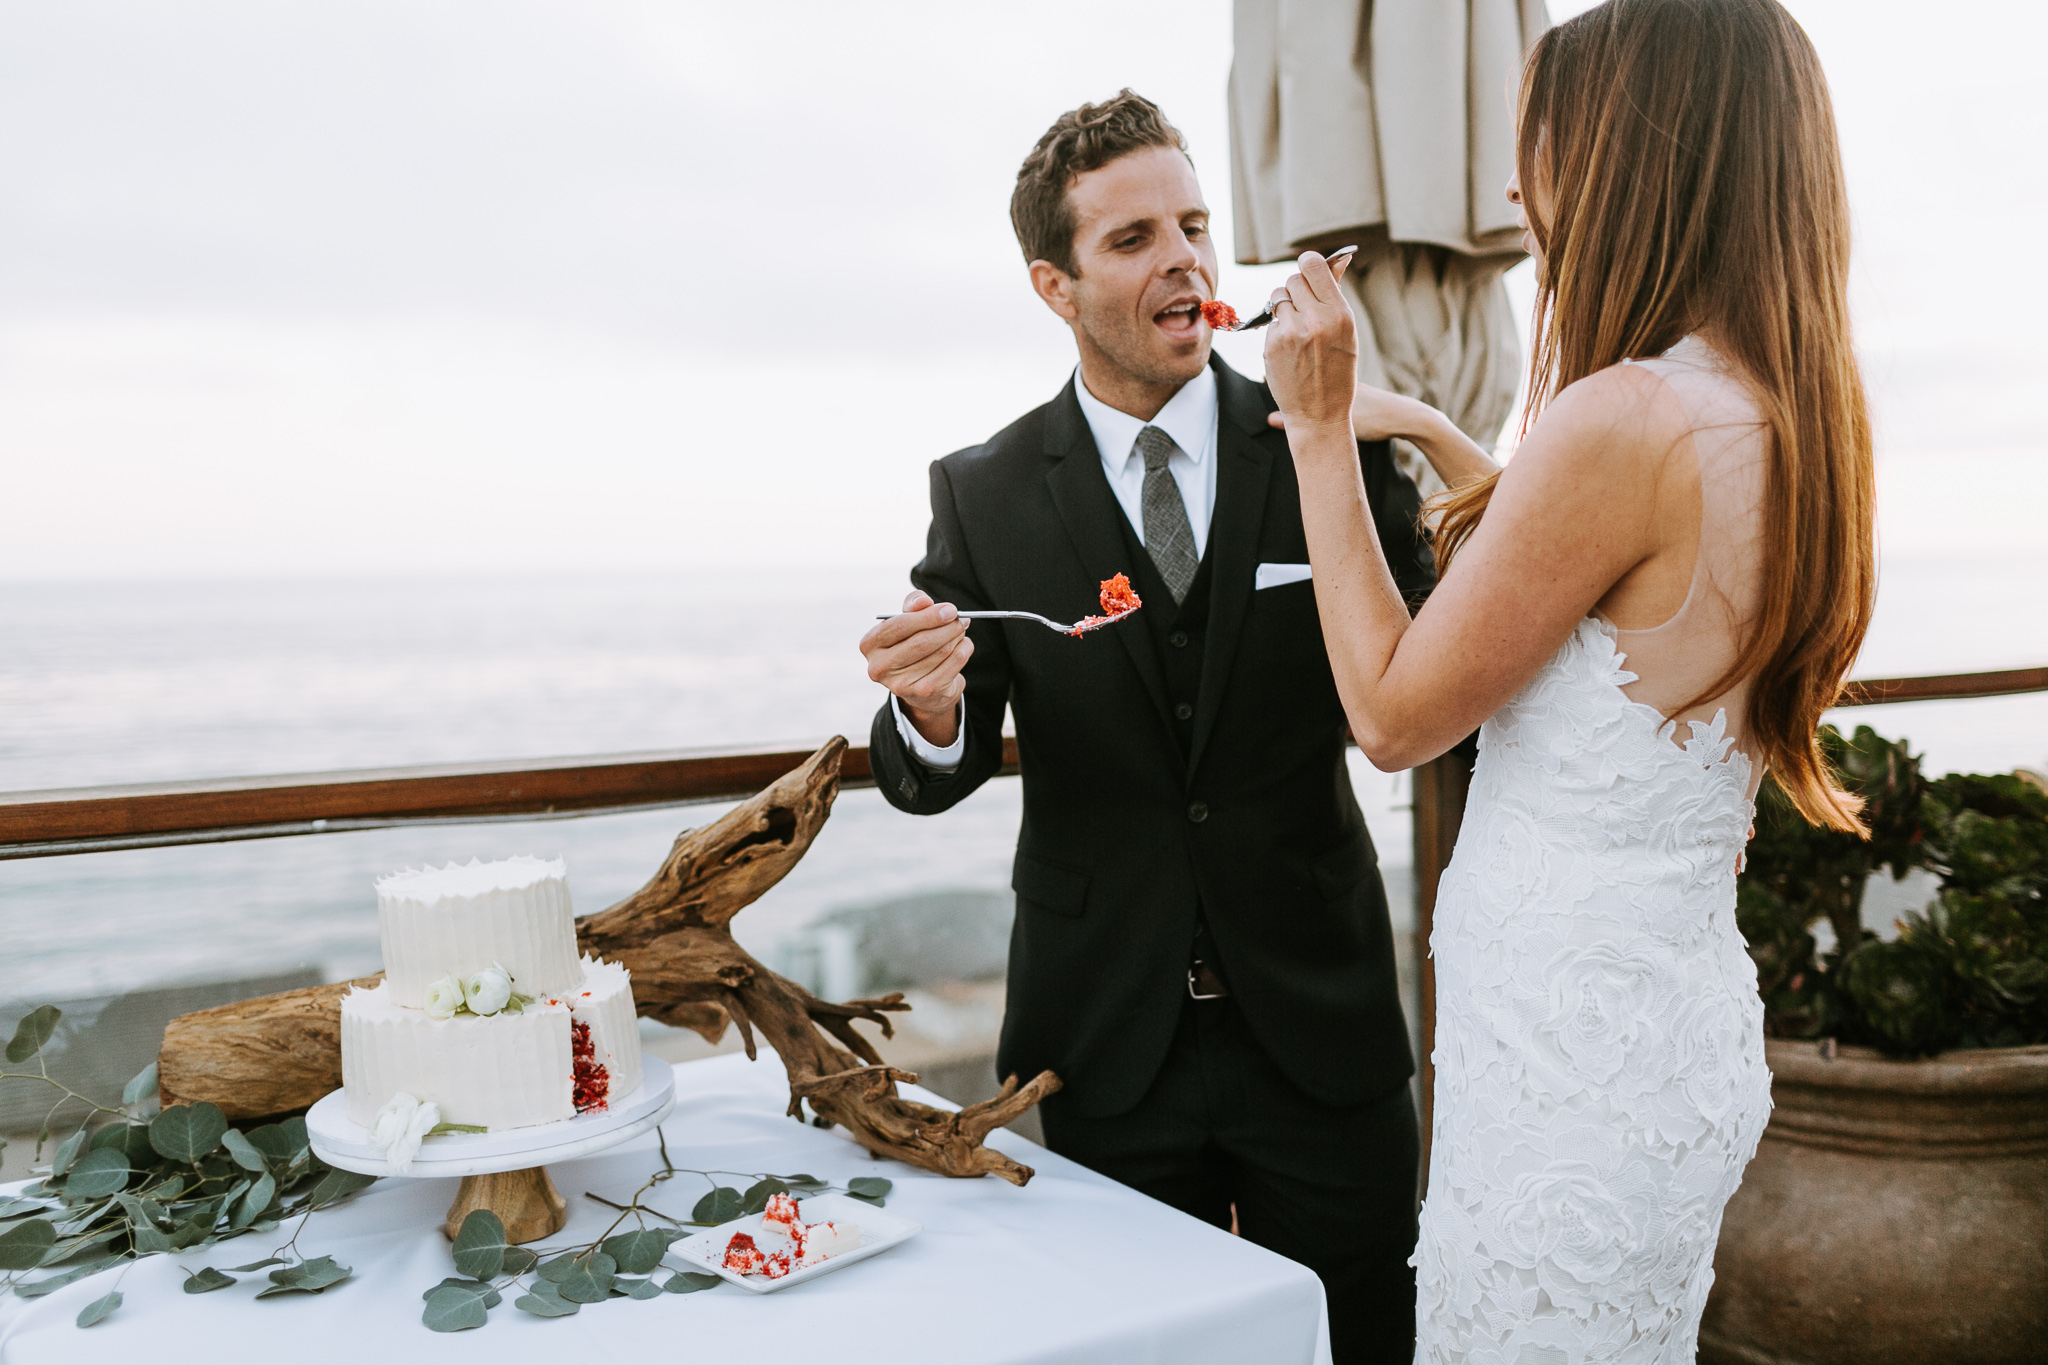 LagunaBeach-WeddingPhotographer-61.jpg